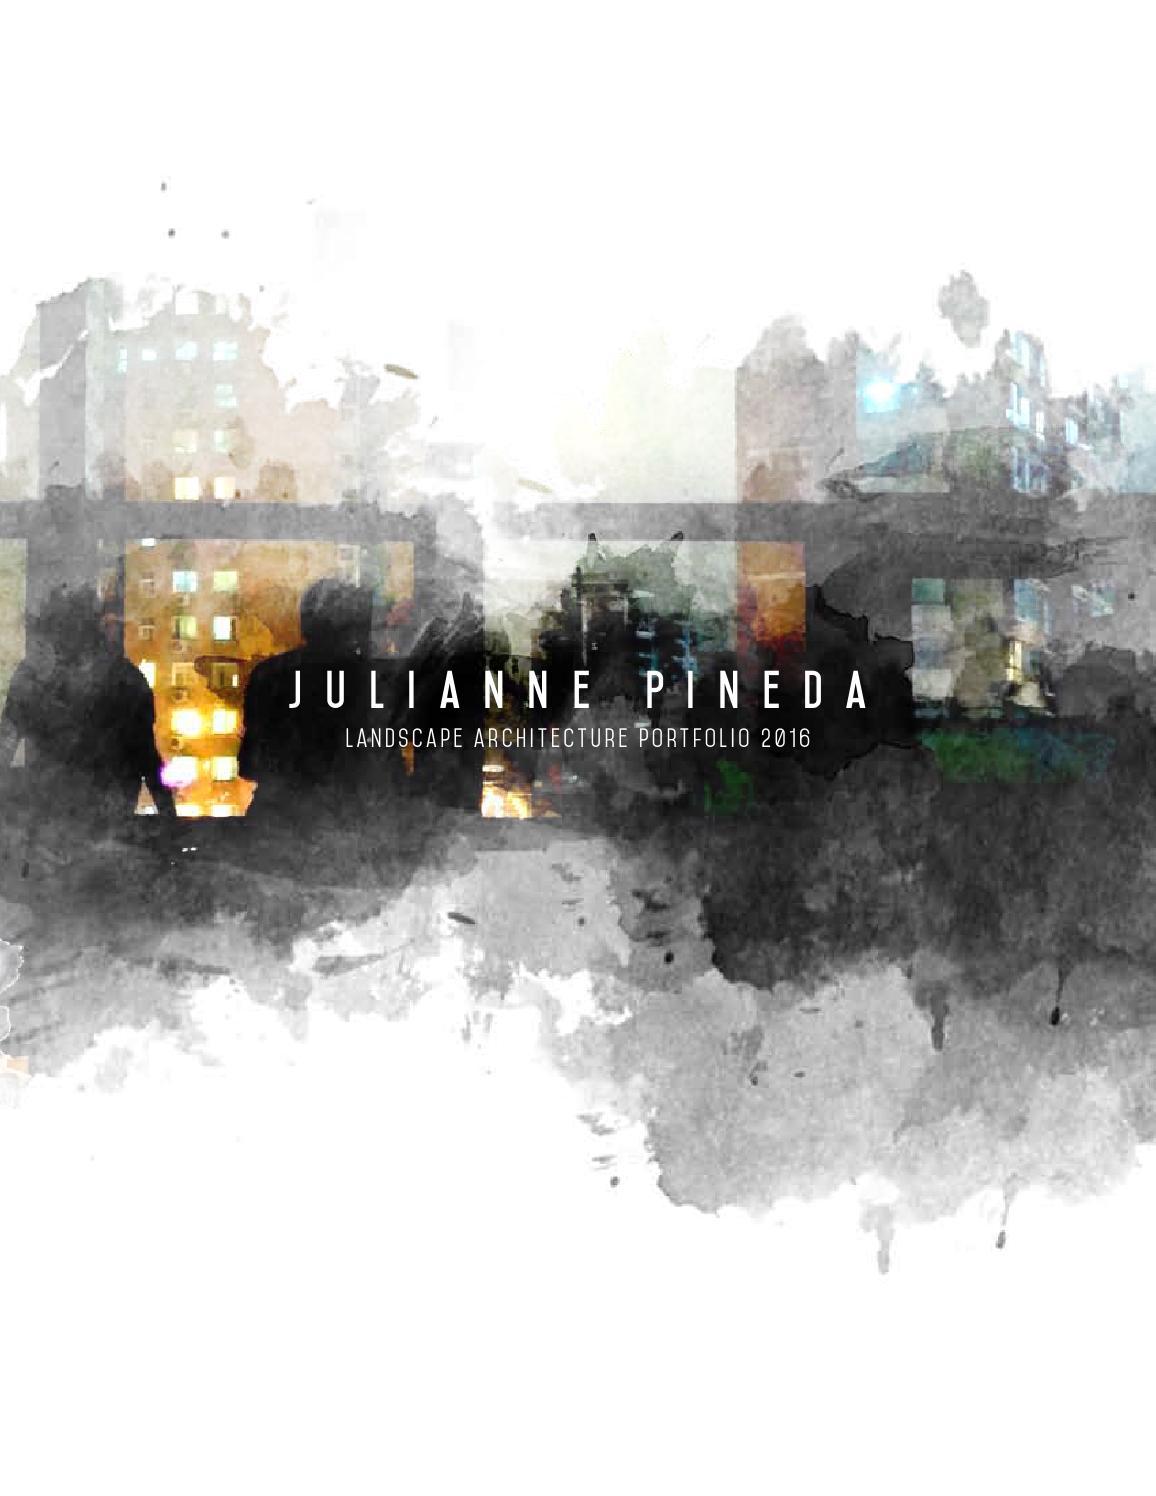 Julianne Pineda Landscape Architecture Portfolio 2016 By